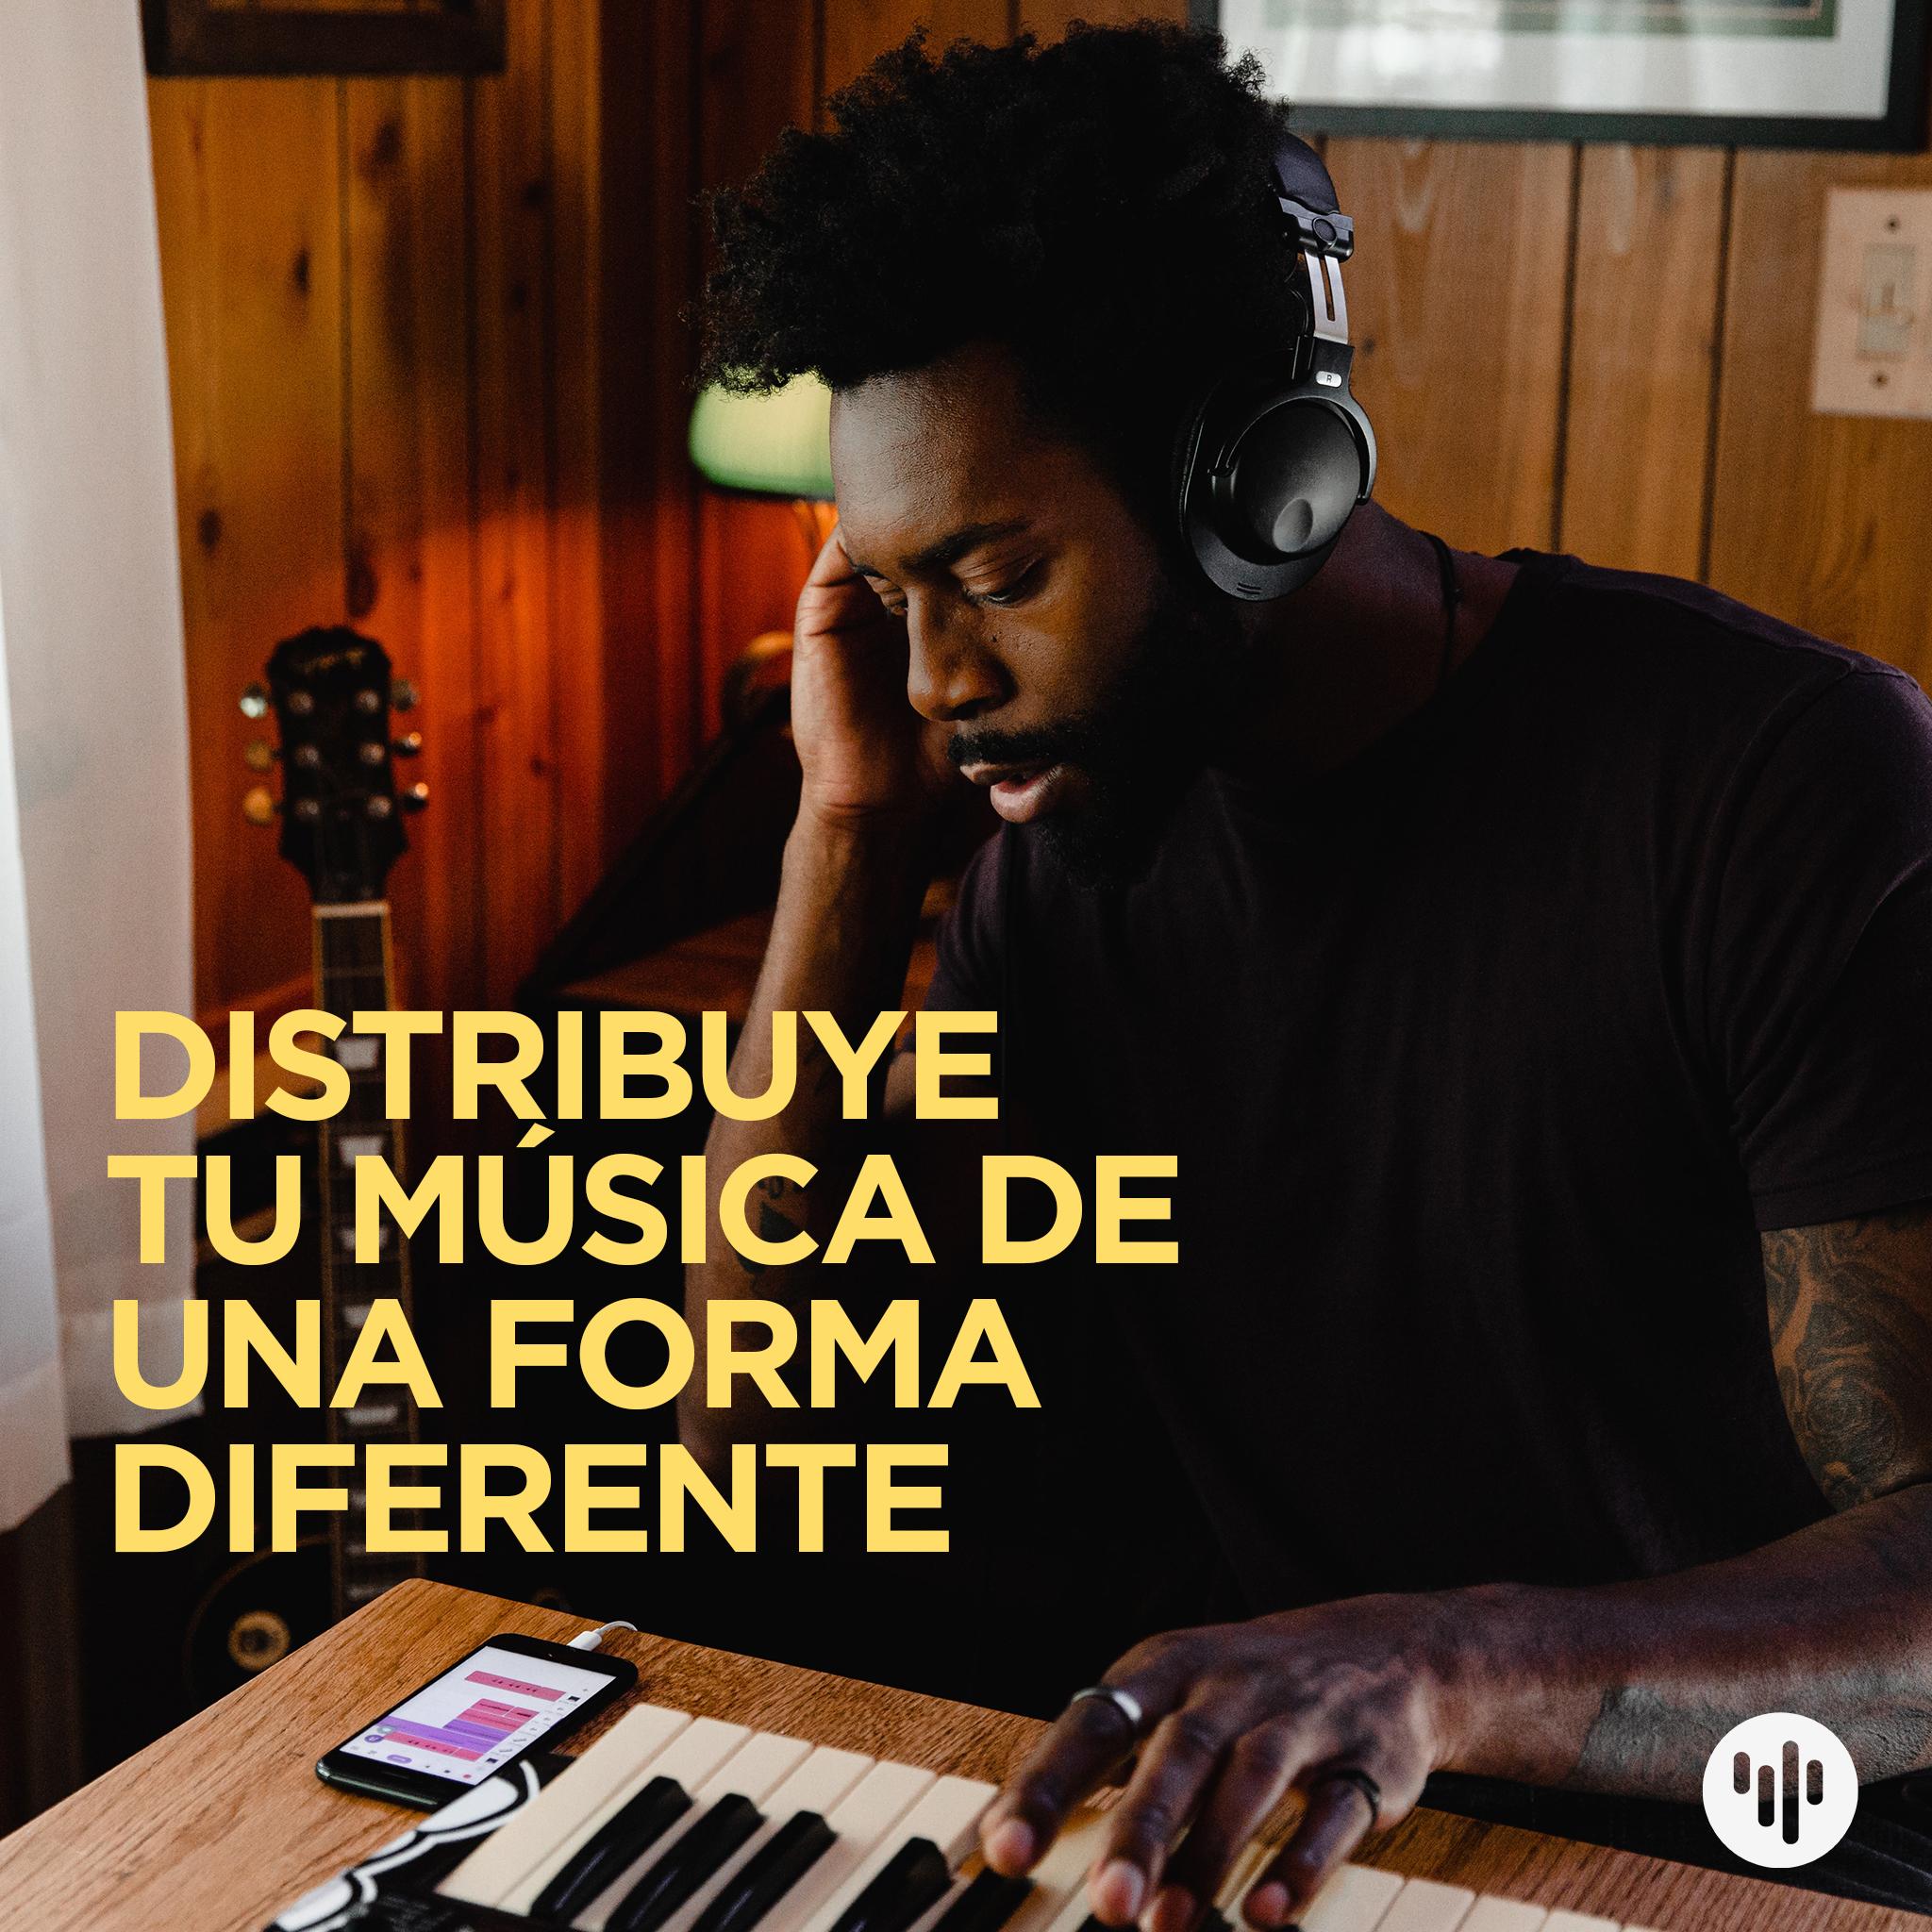 Distribuye tu musica de una forma diferente